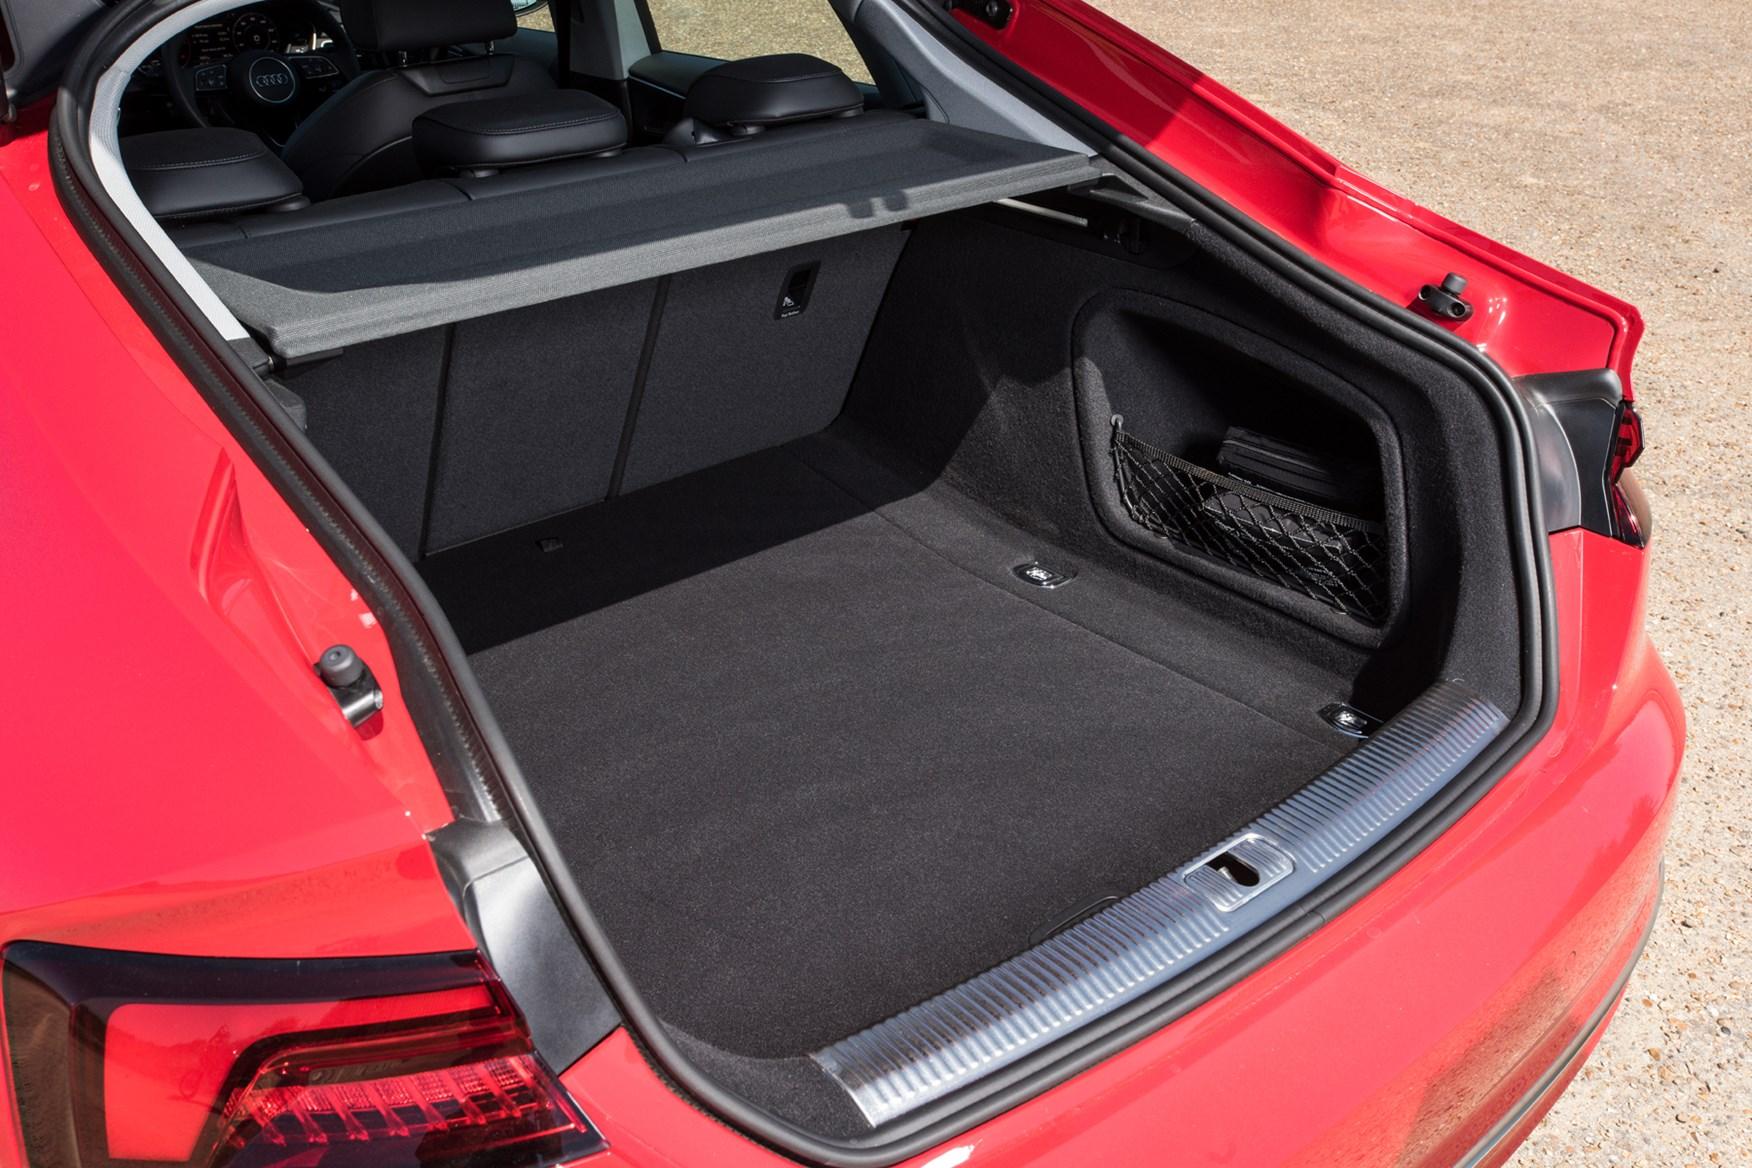 Audi A5 Sportback boot